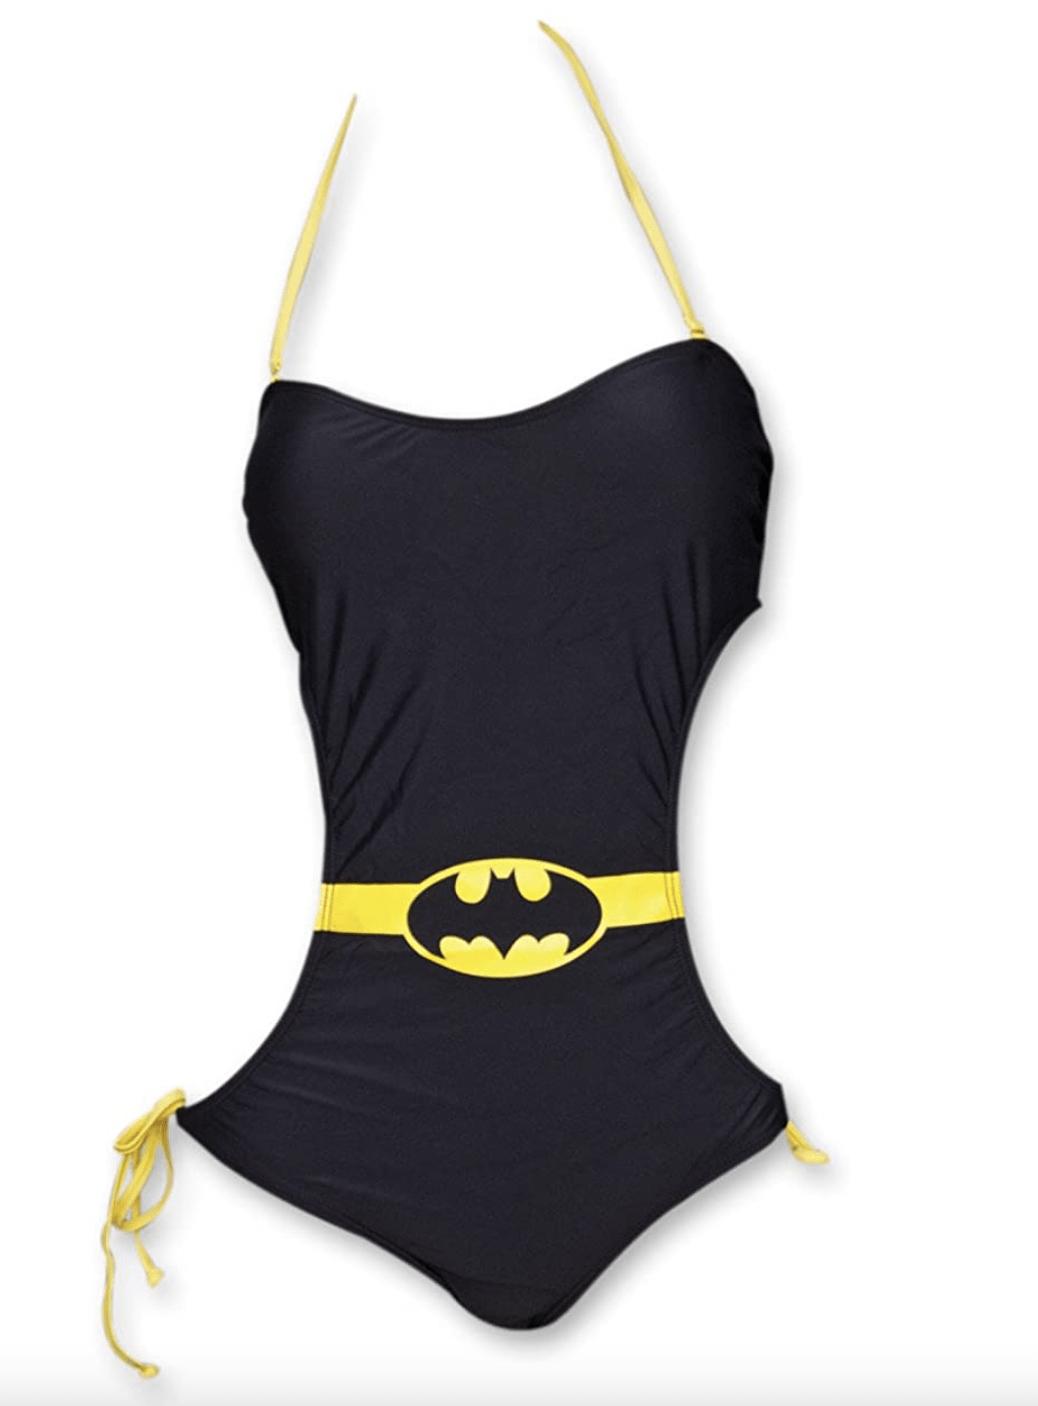 Nerdy Swimsuits - Batman